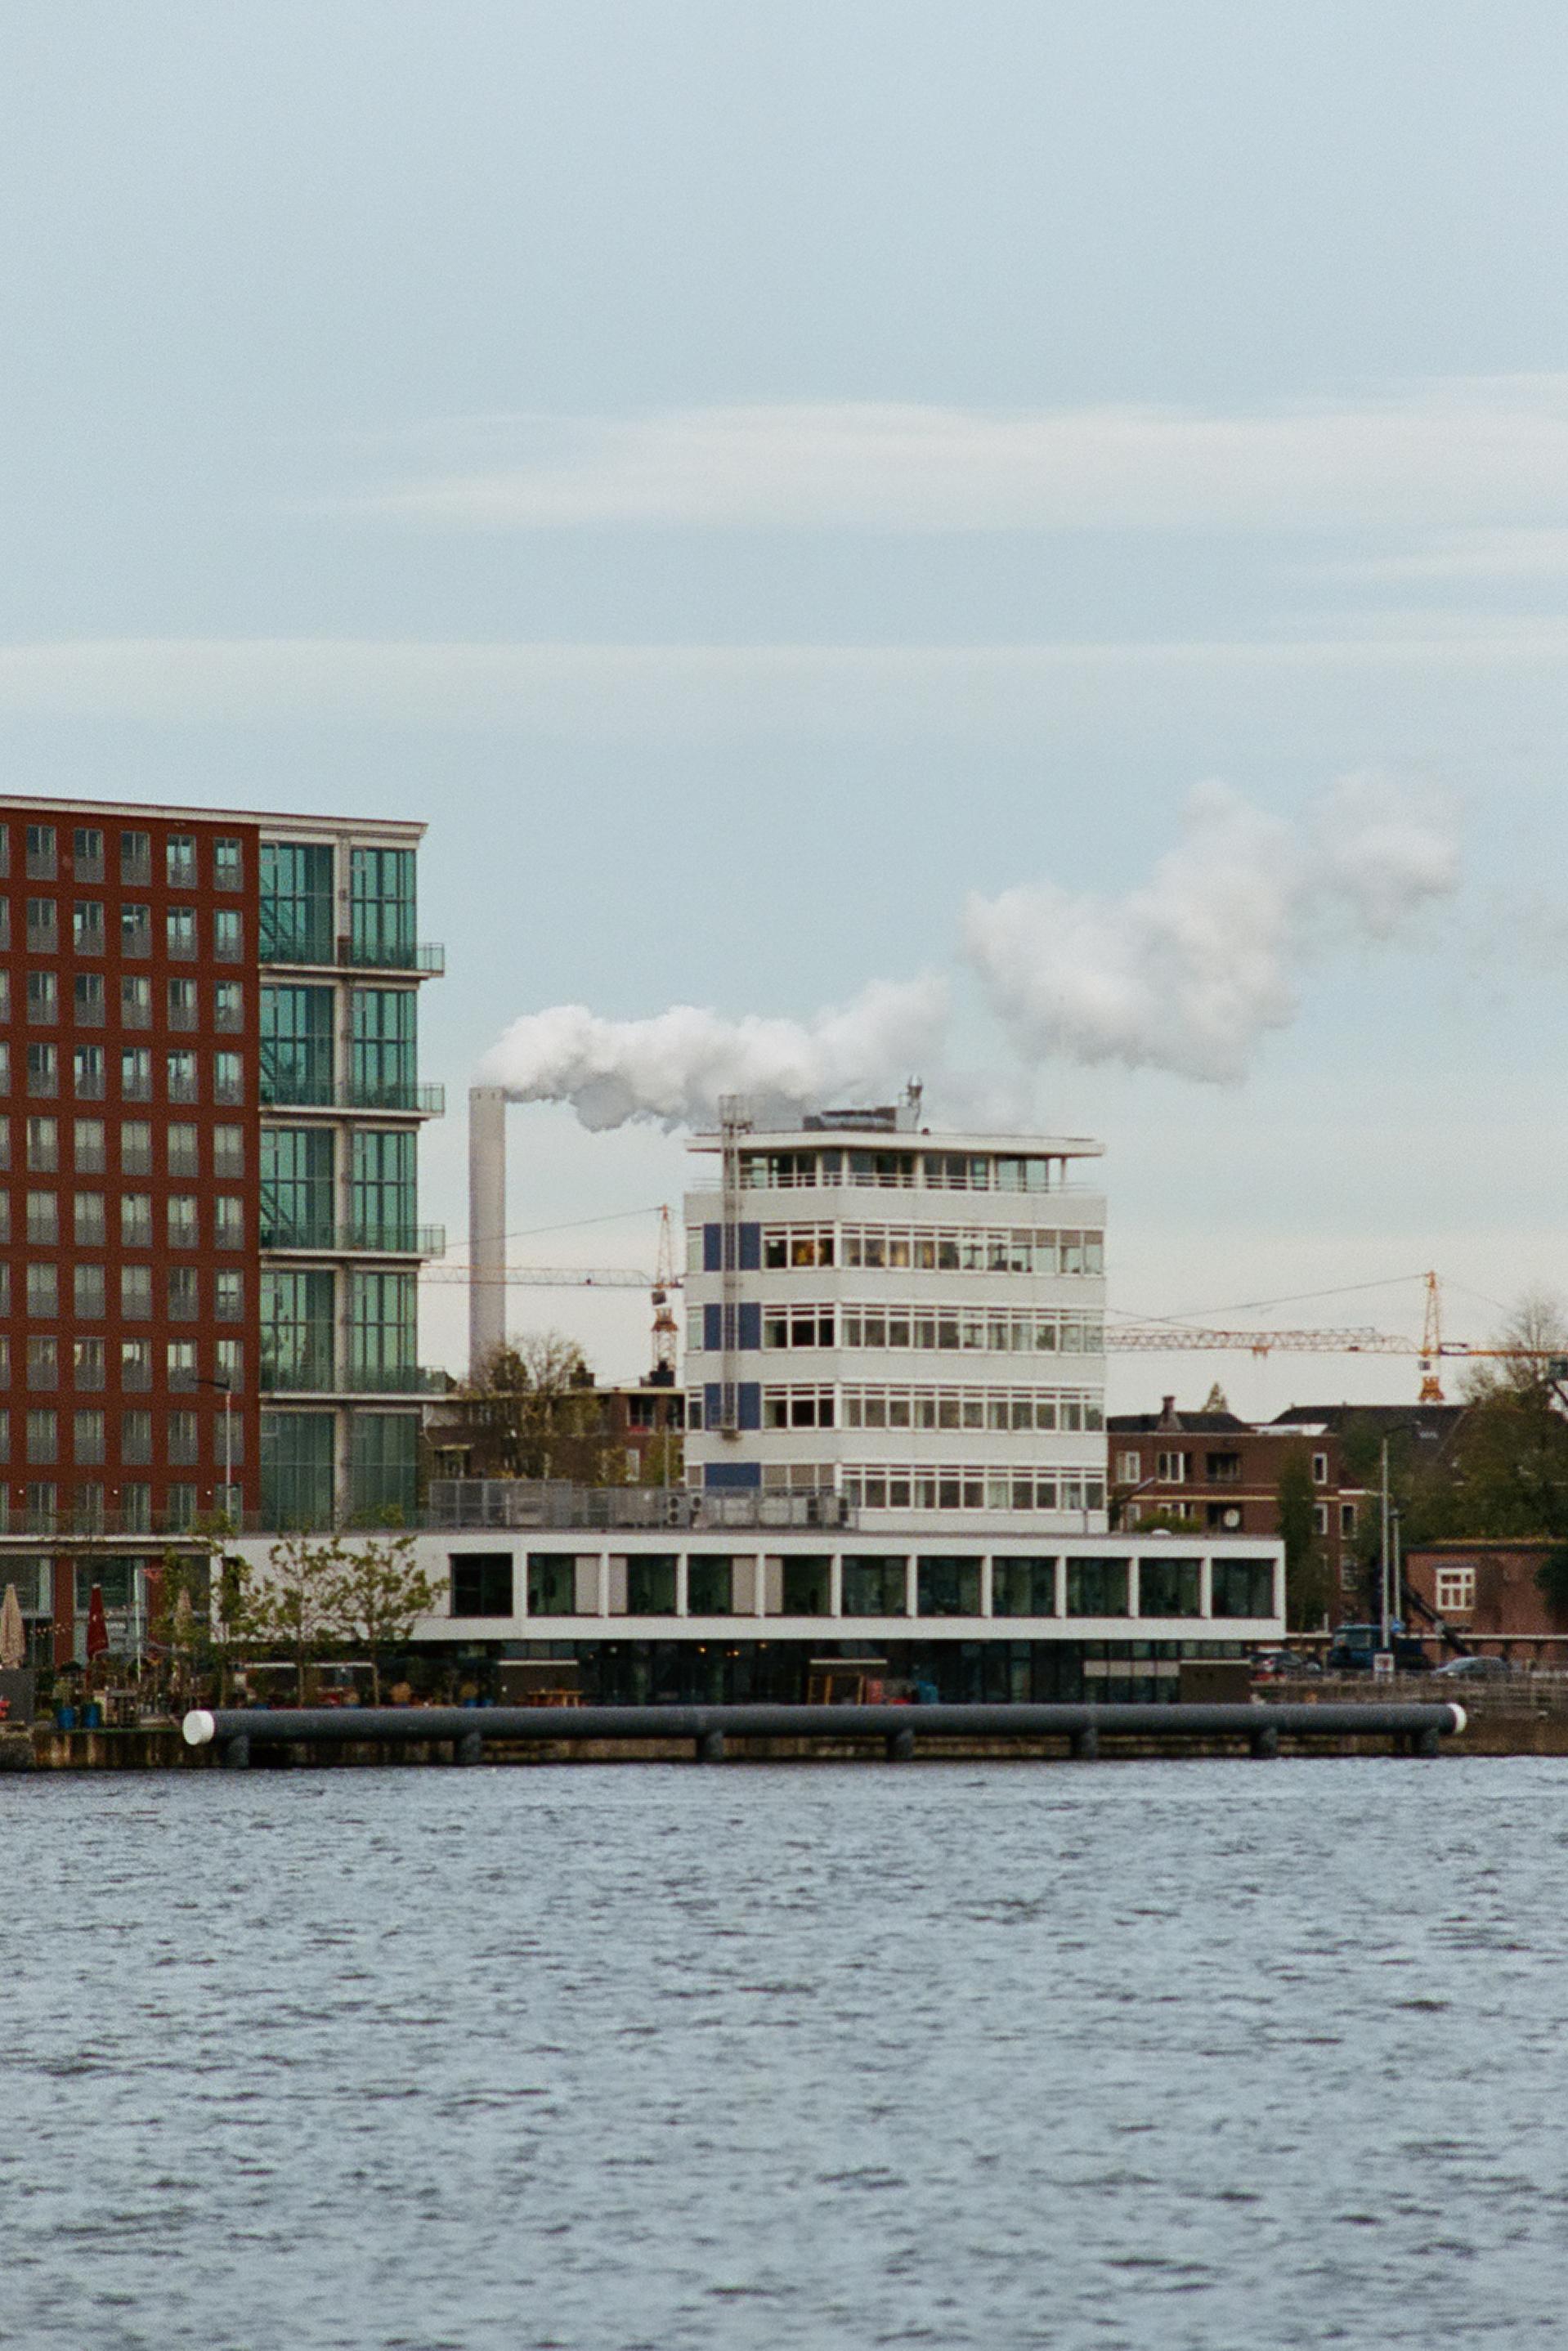 Amsterdam_0012 copy.jpg